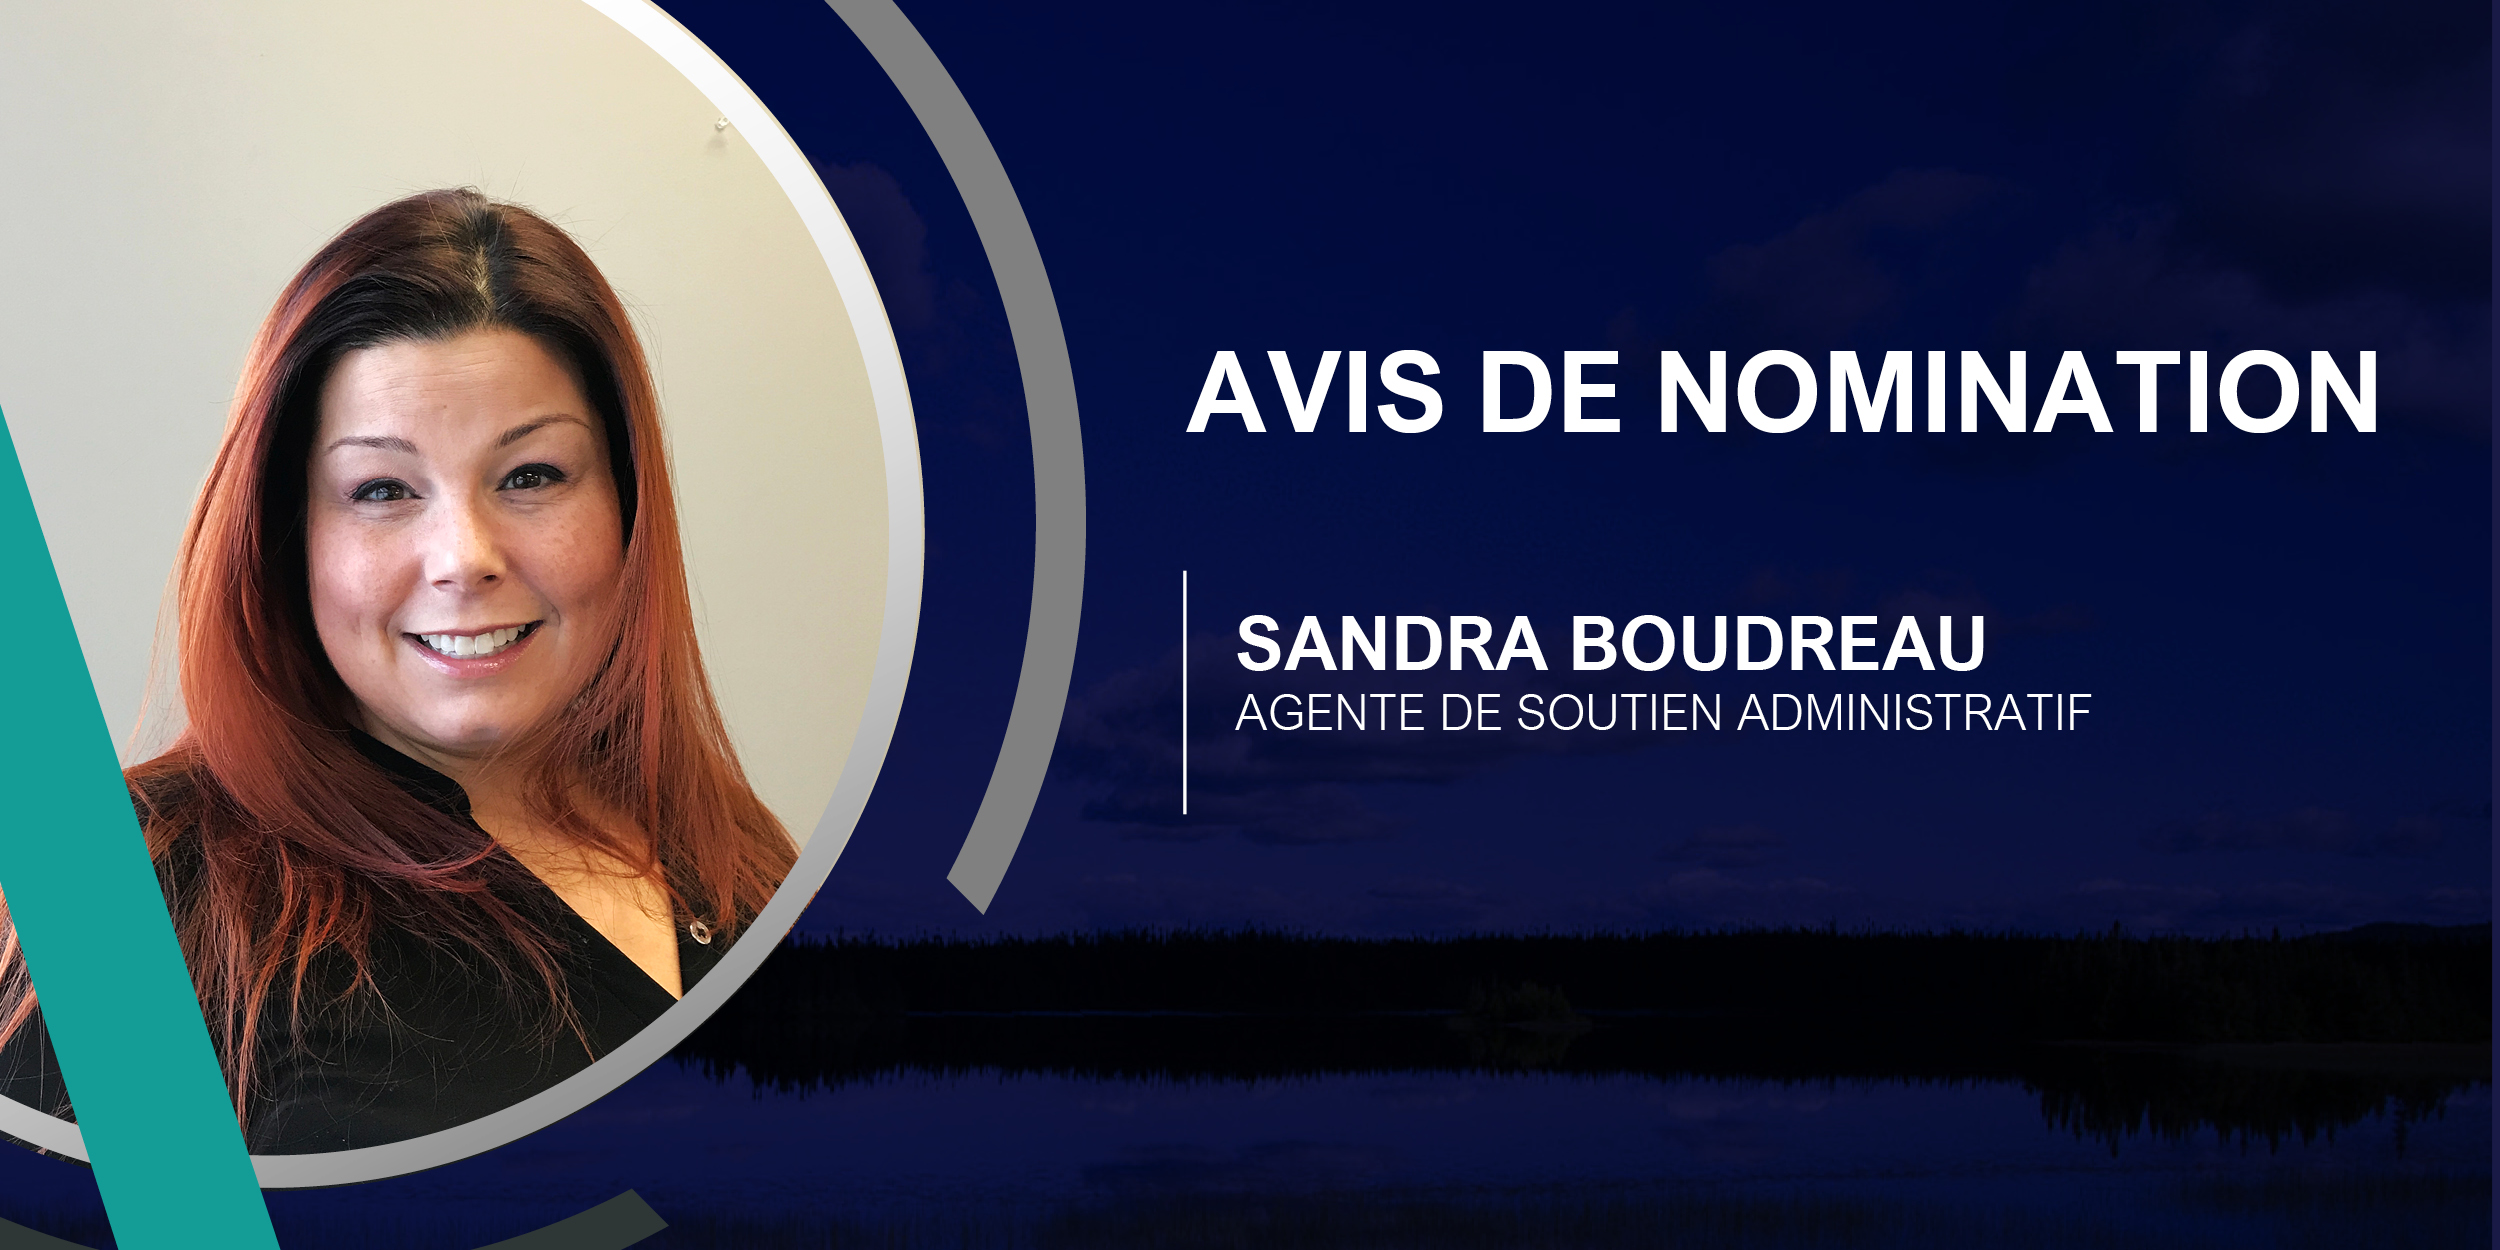 Avis_nomination-Sandra_Boudreau